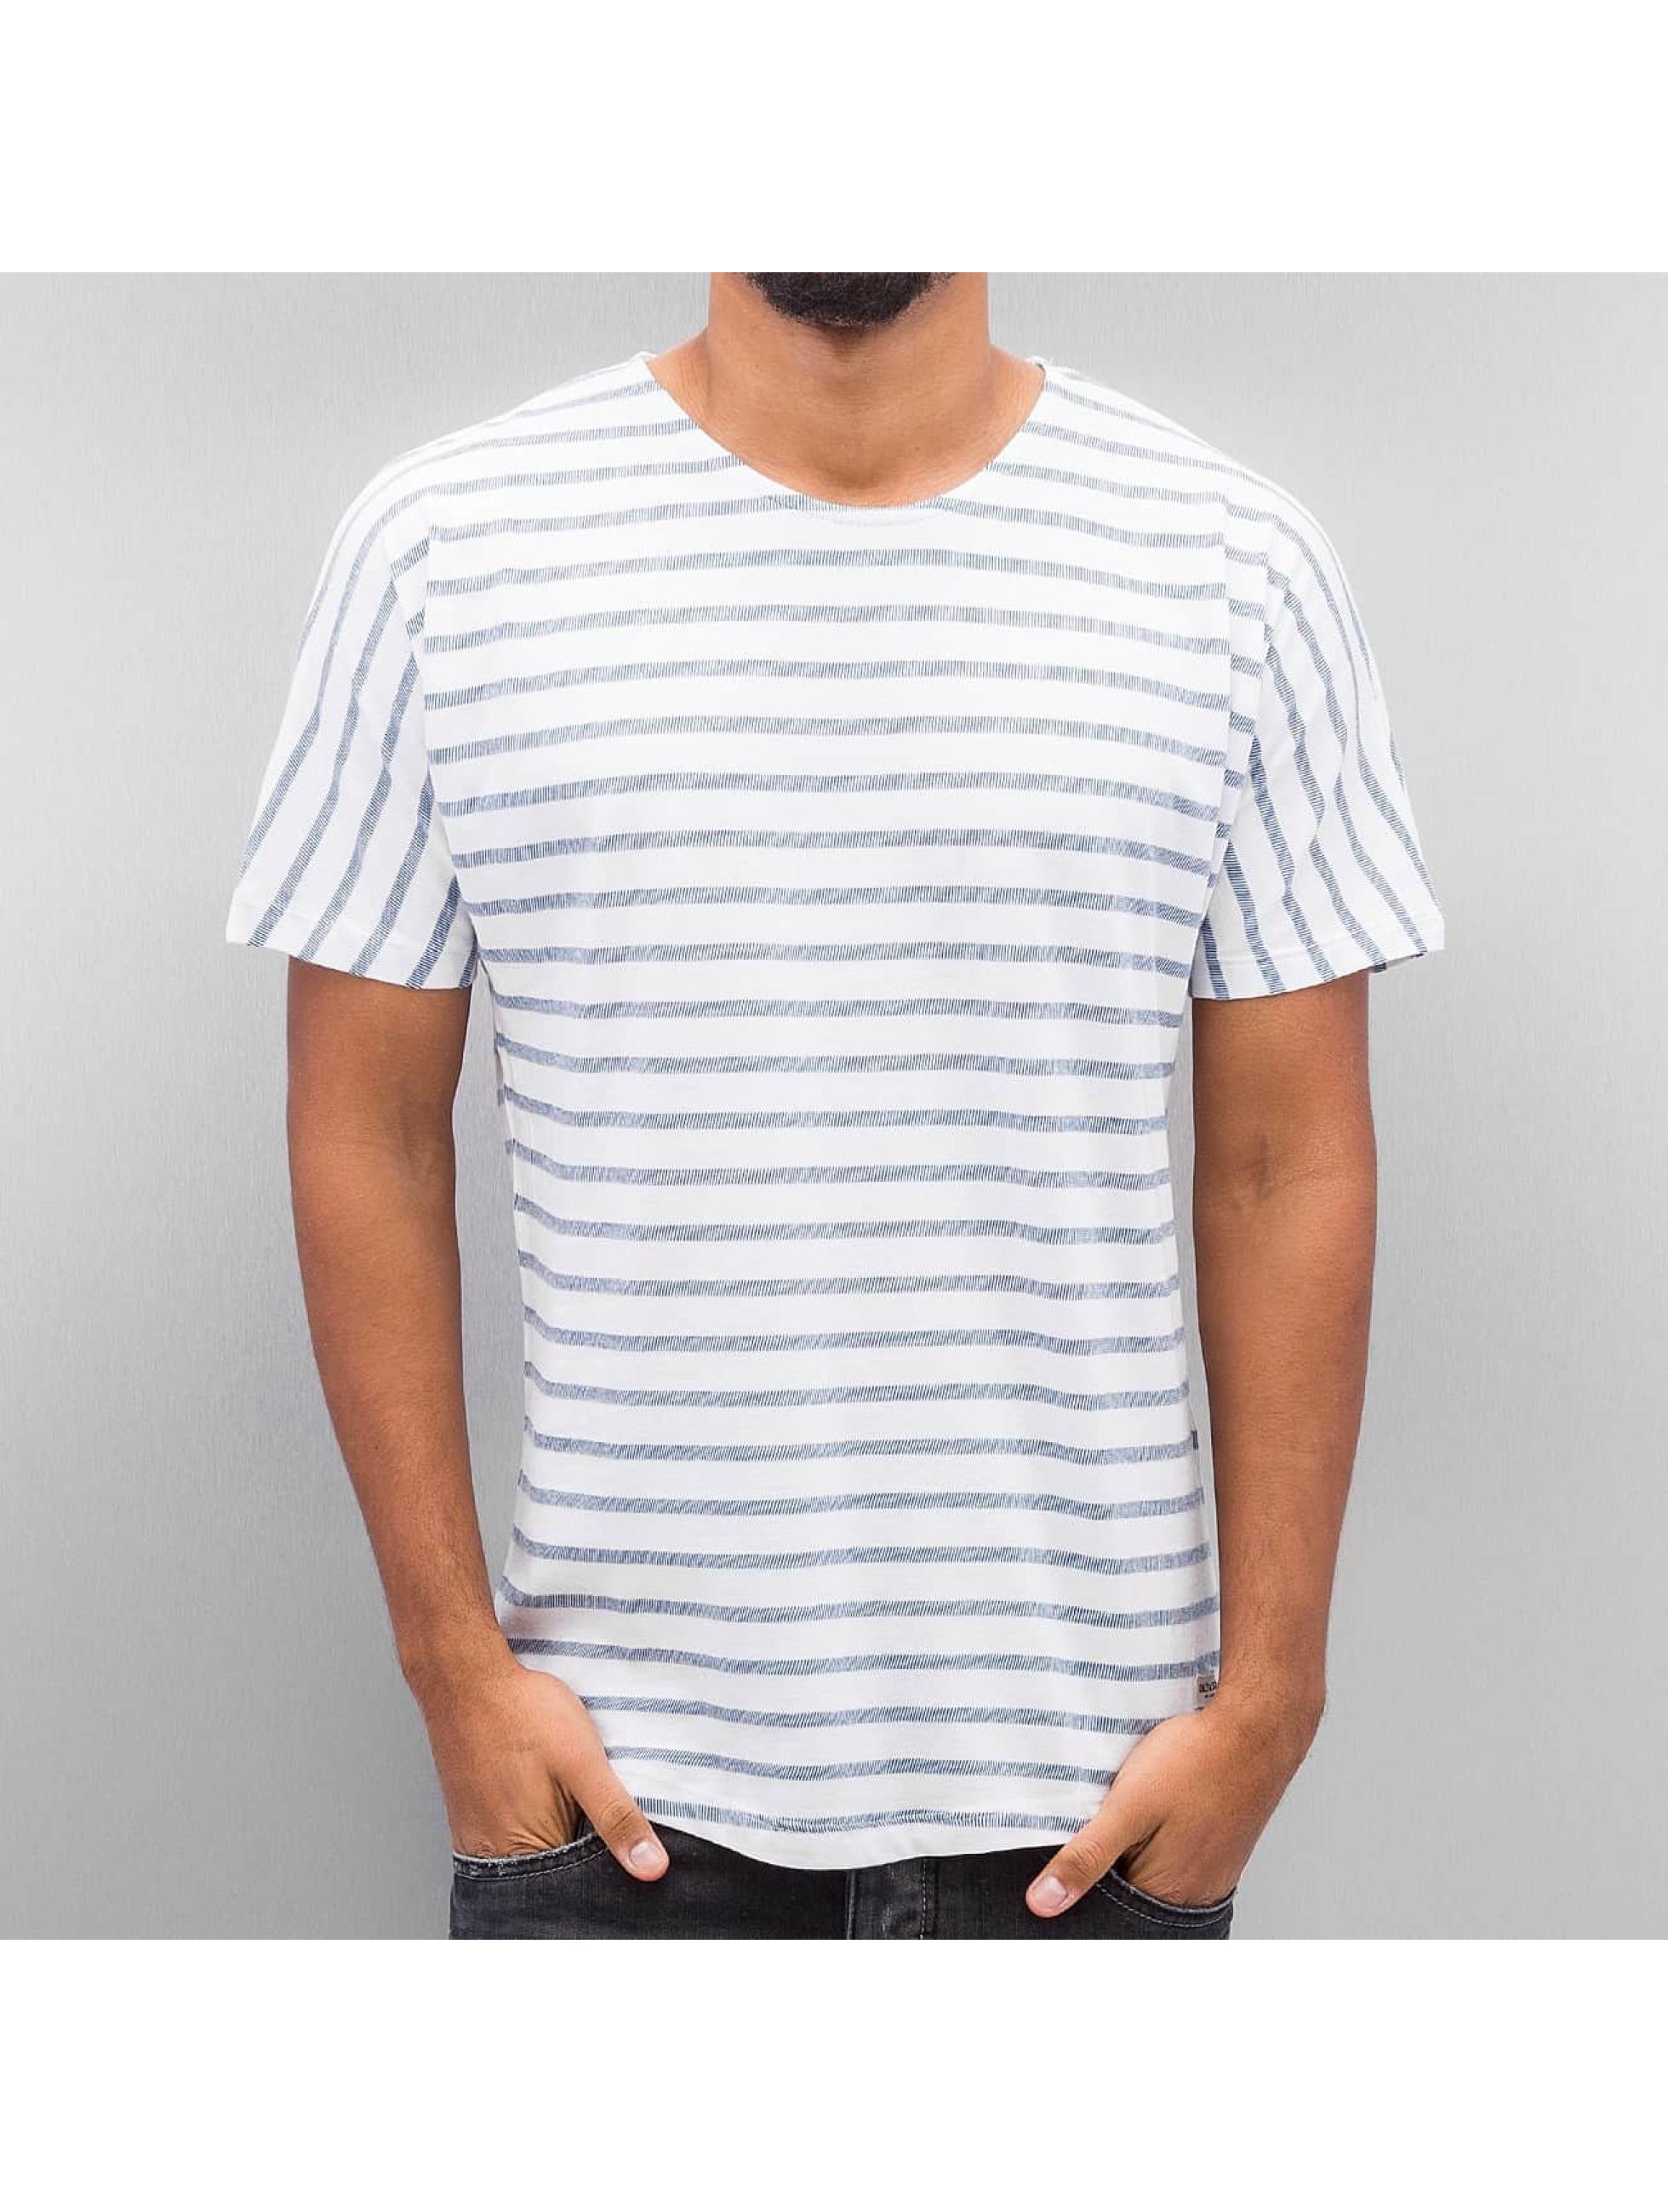 T-Shirt onsNanak in türkis